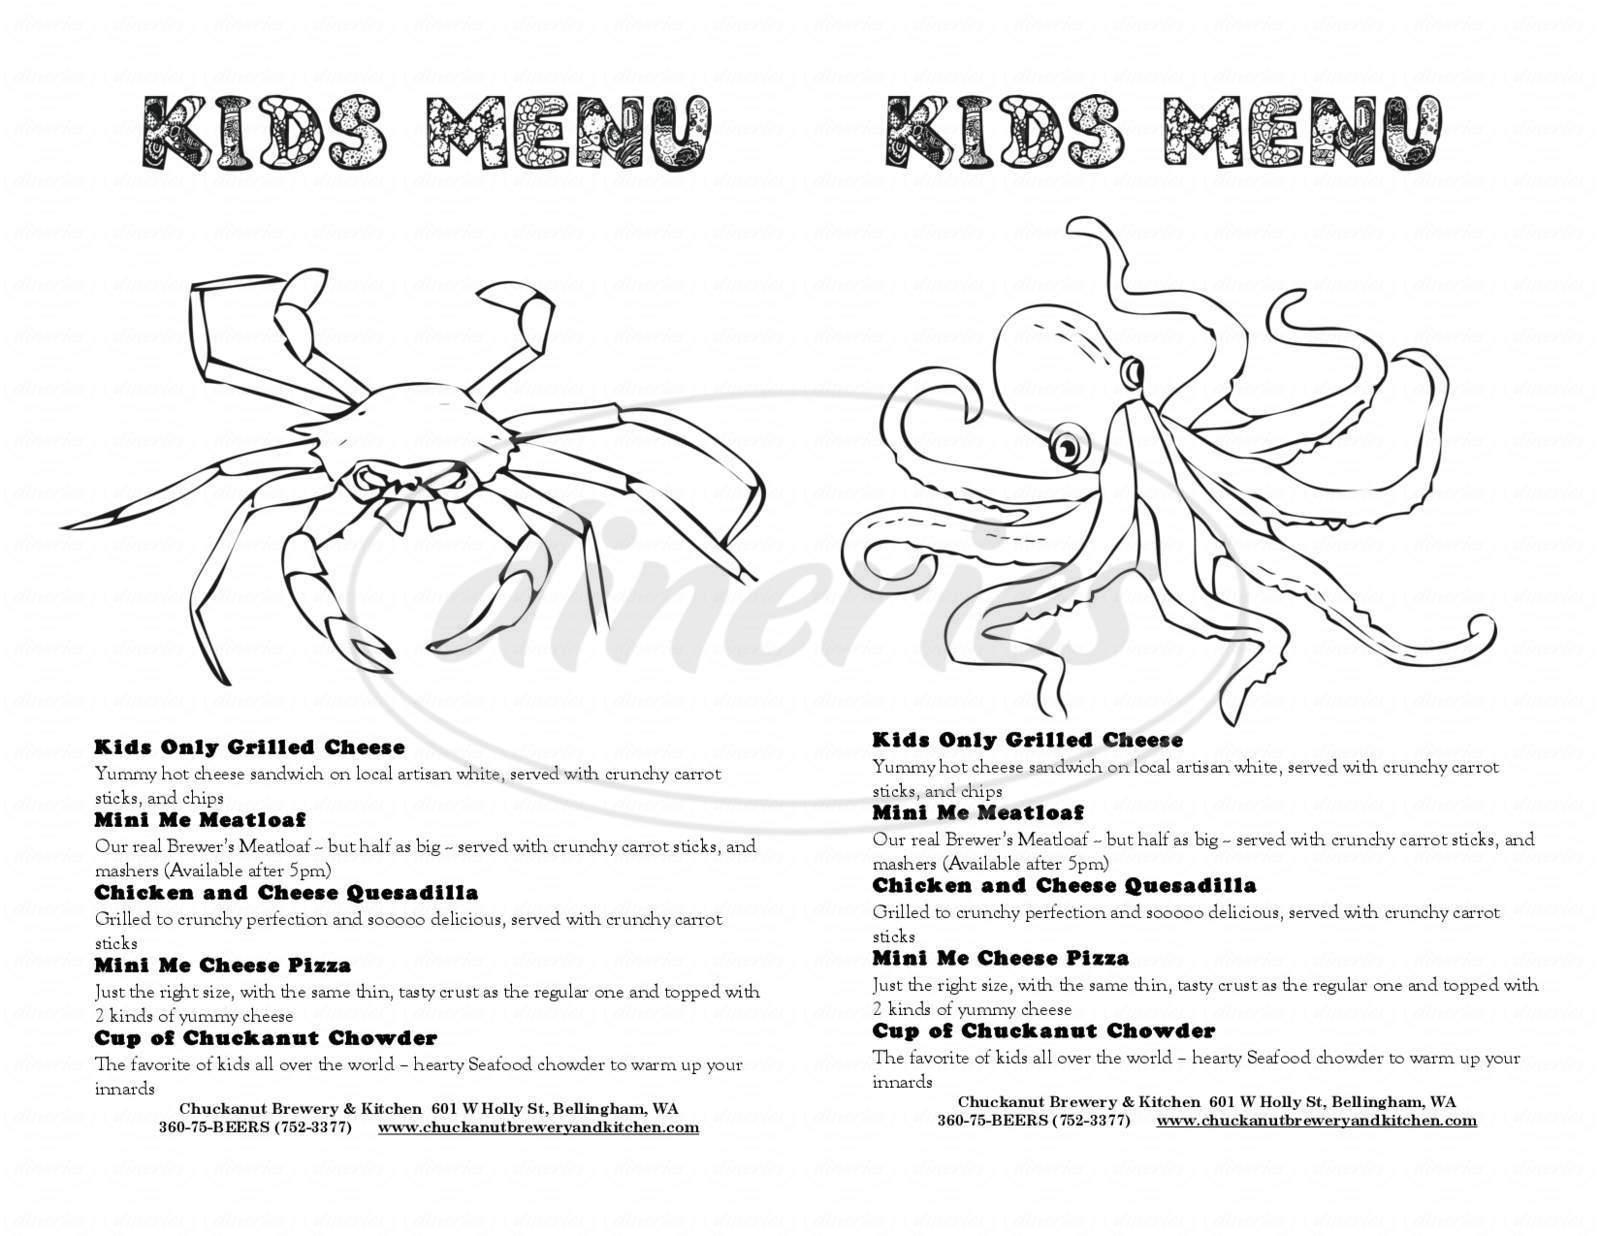 menu for Chuckanut Brewery & Kitchen